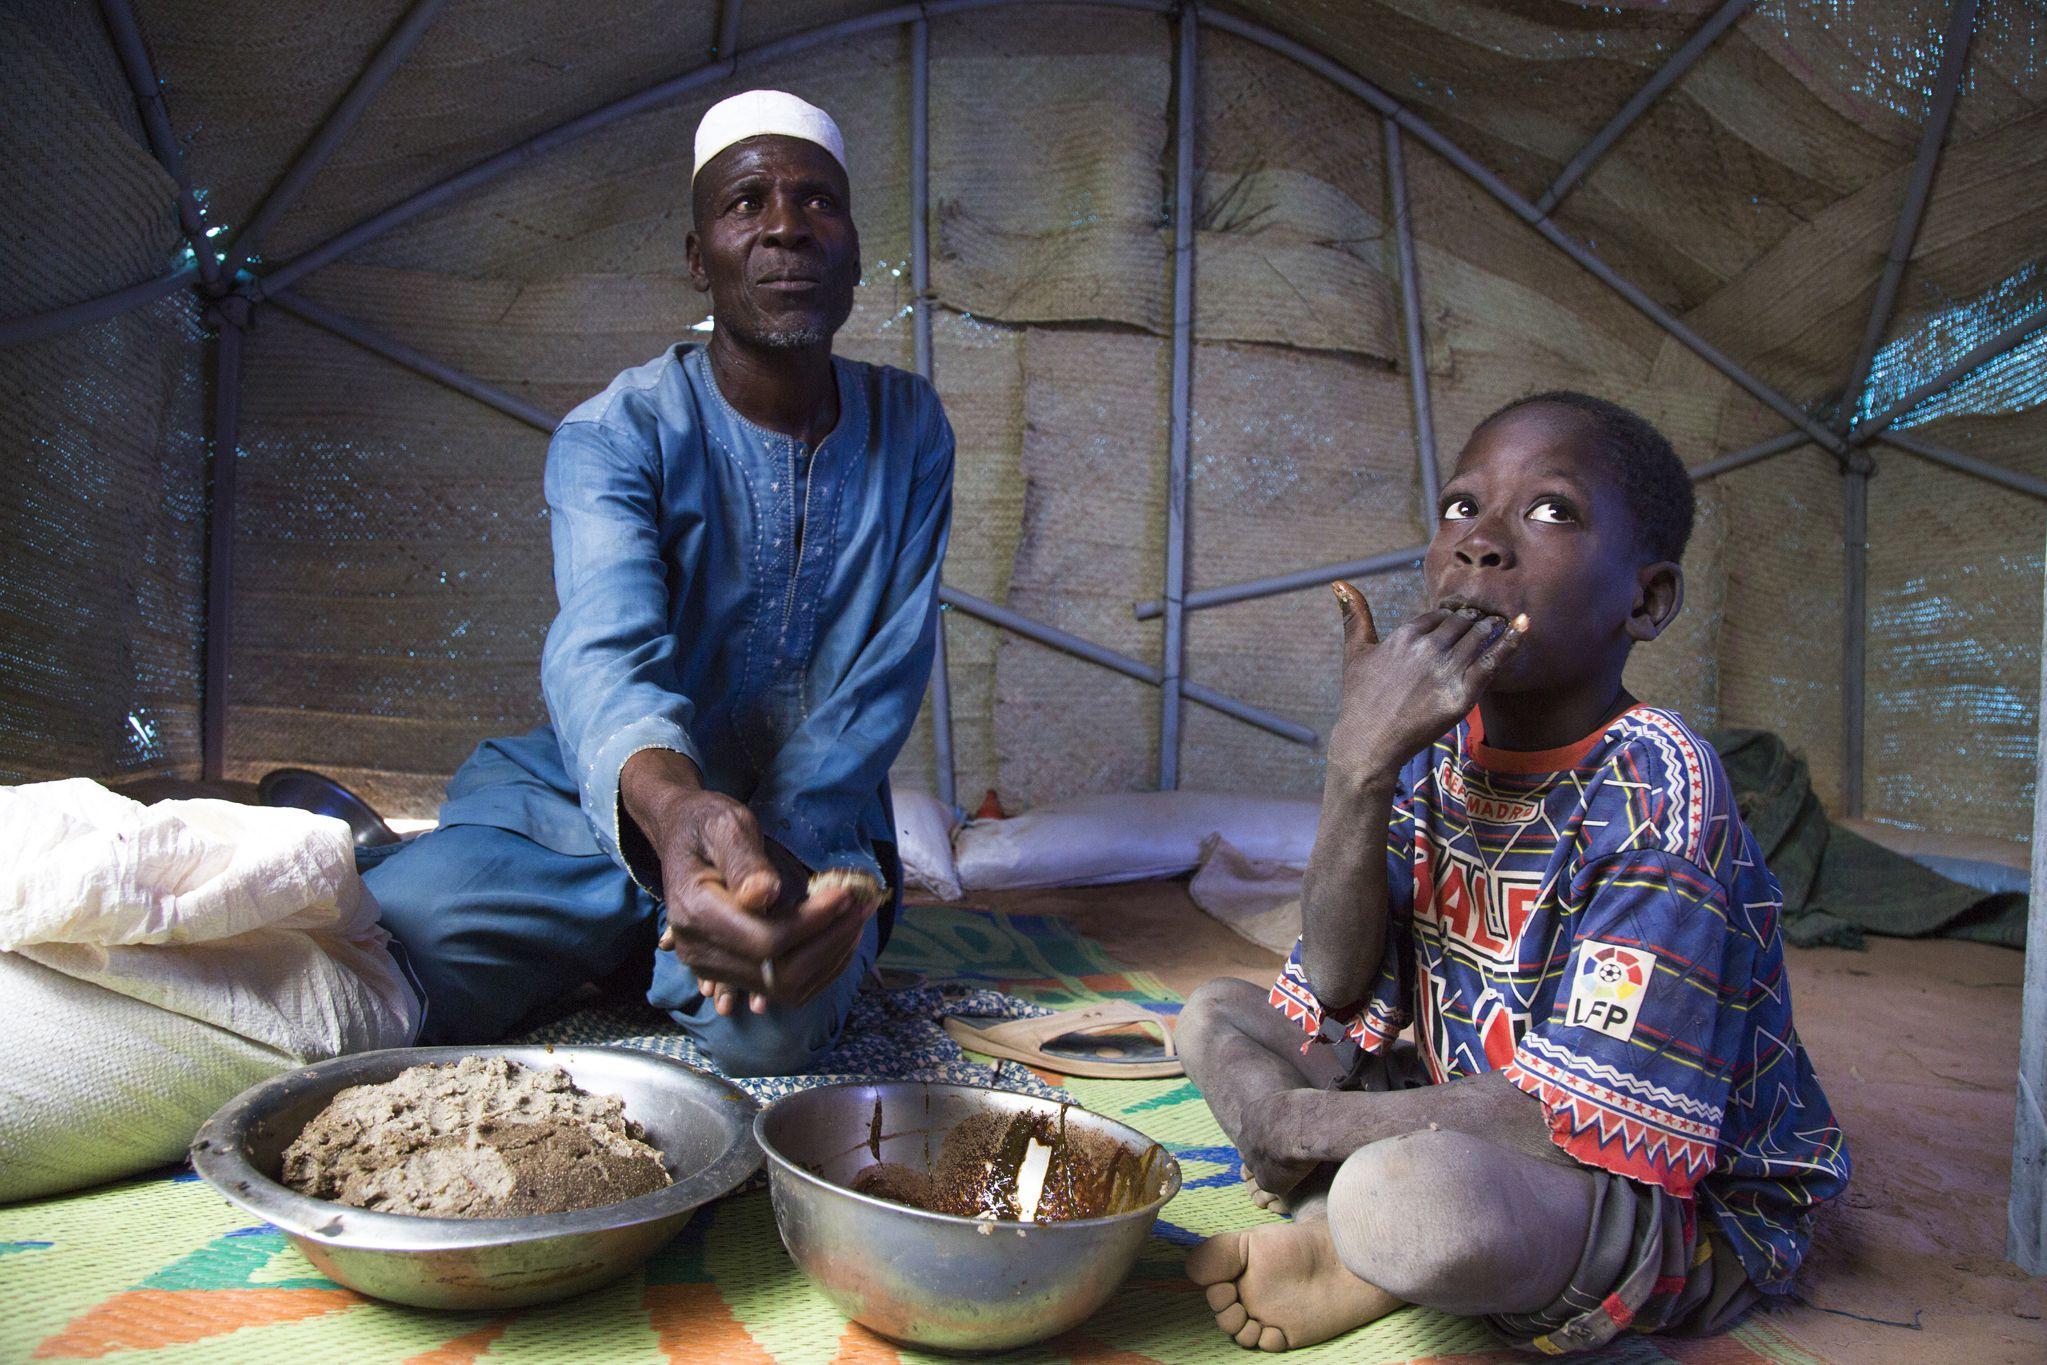 Африканським країнам загрожує голод